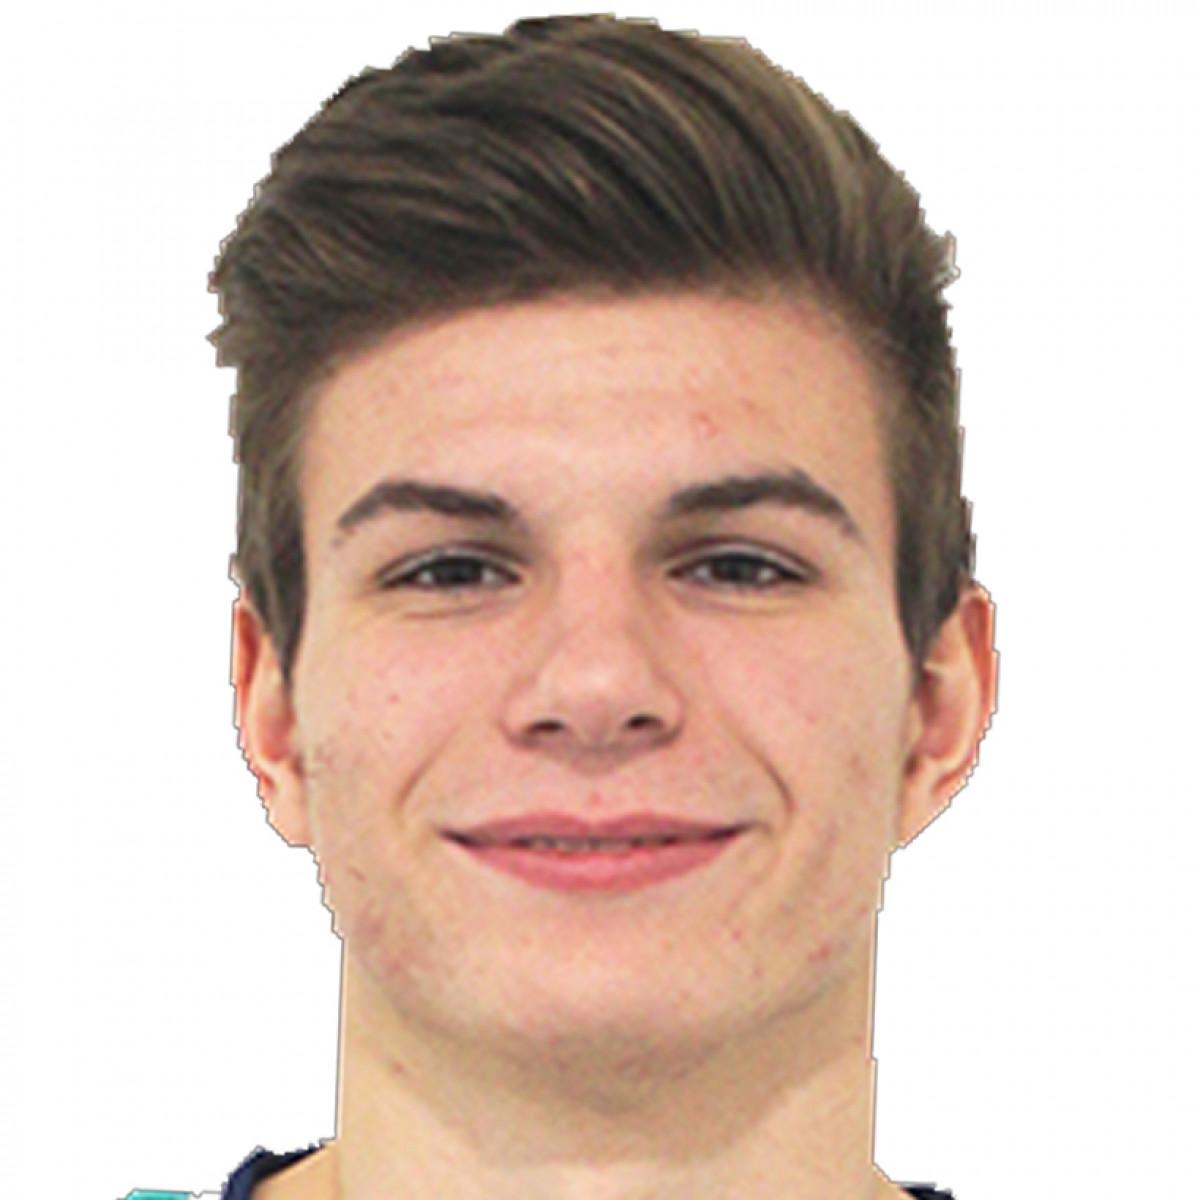 Alex Skoczylas